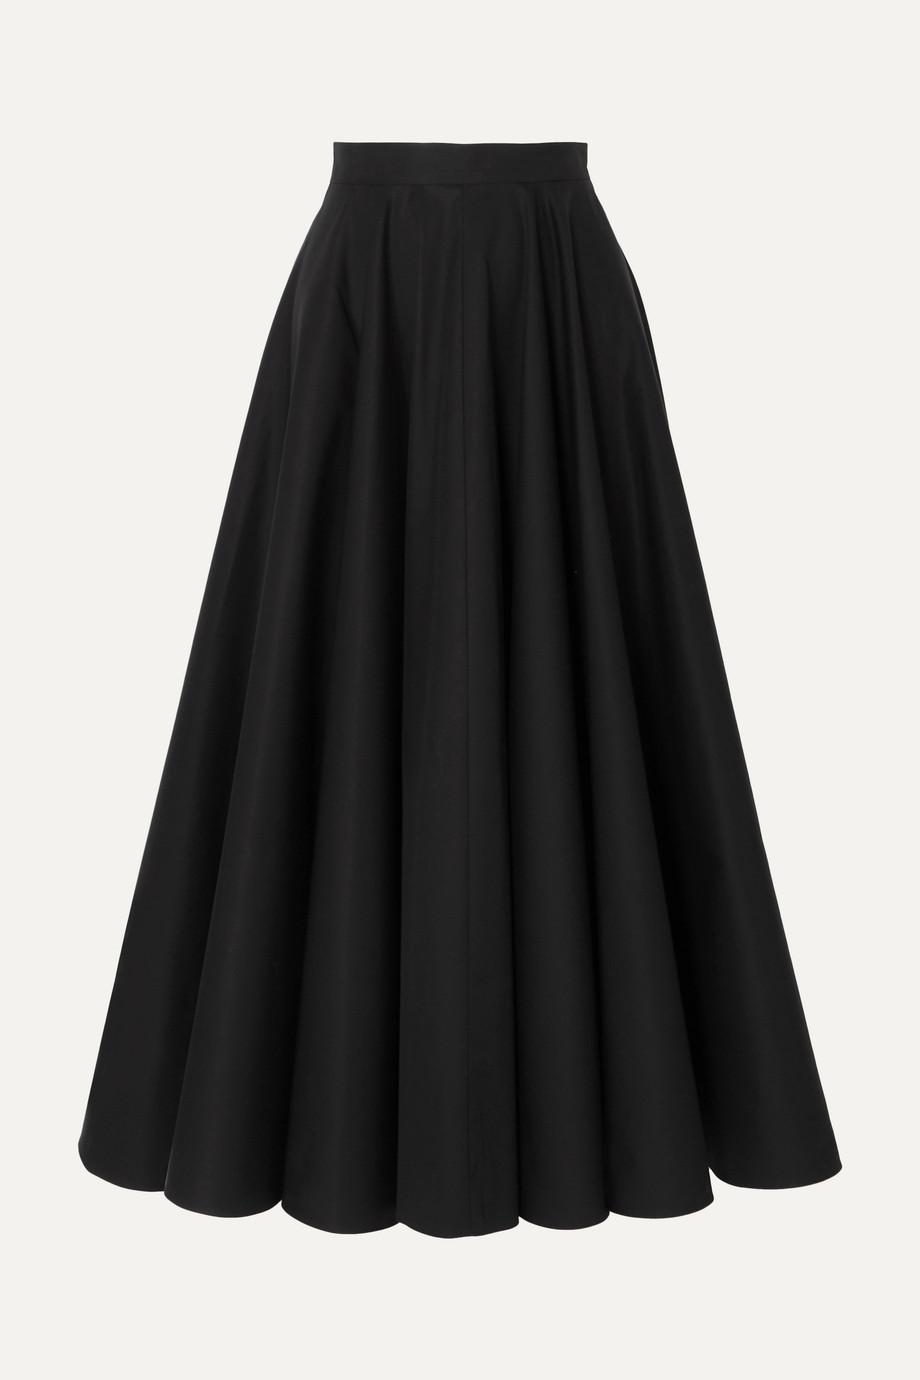 Alaïa Pleated cotton-twill midi skirt